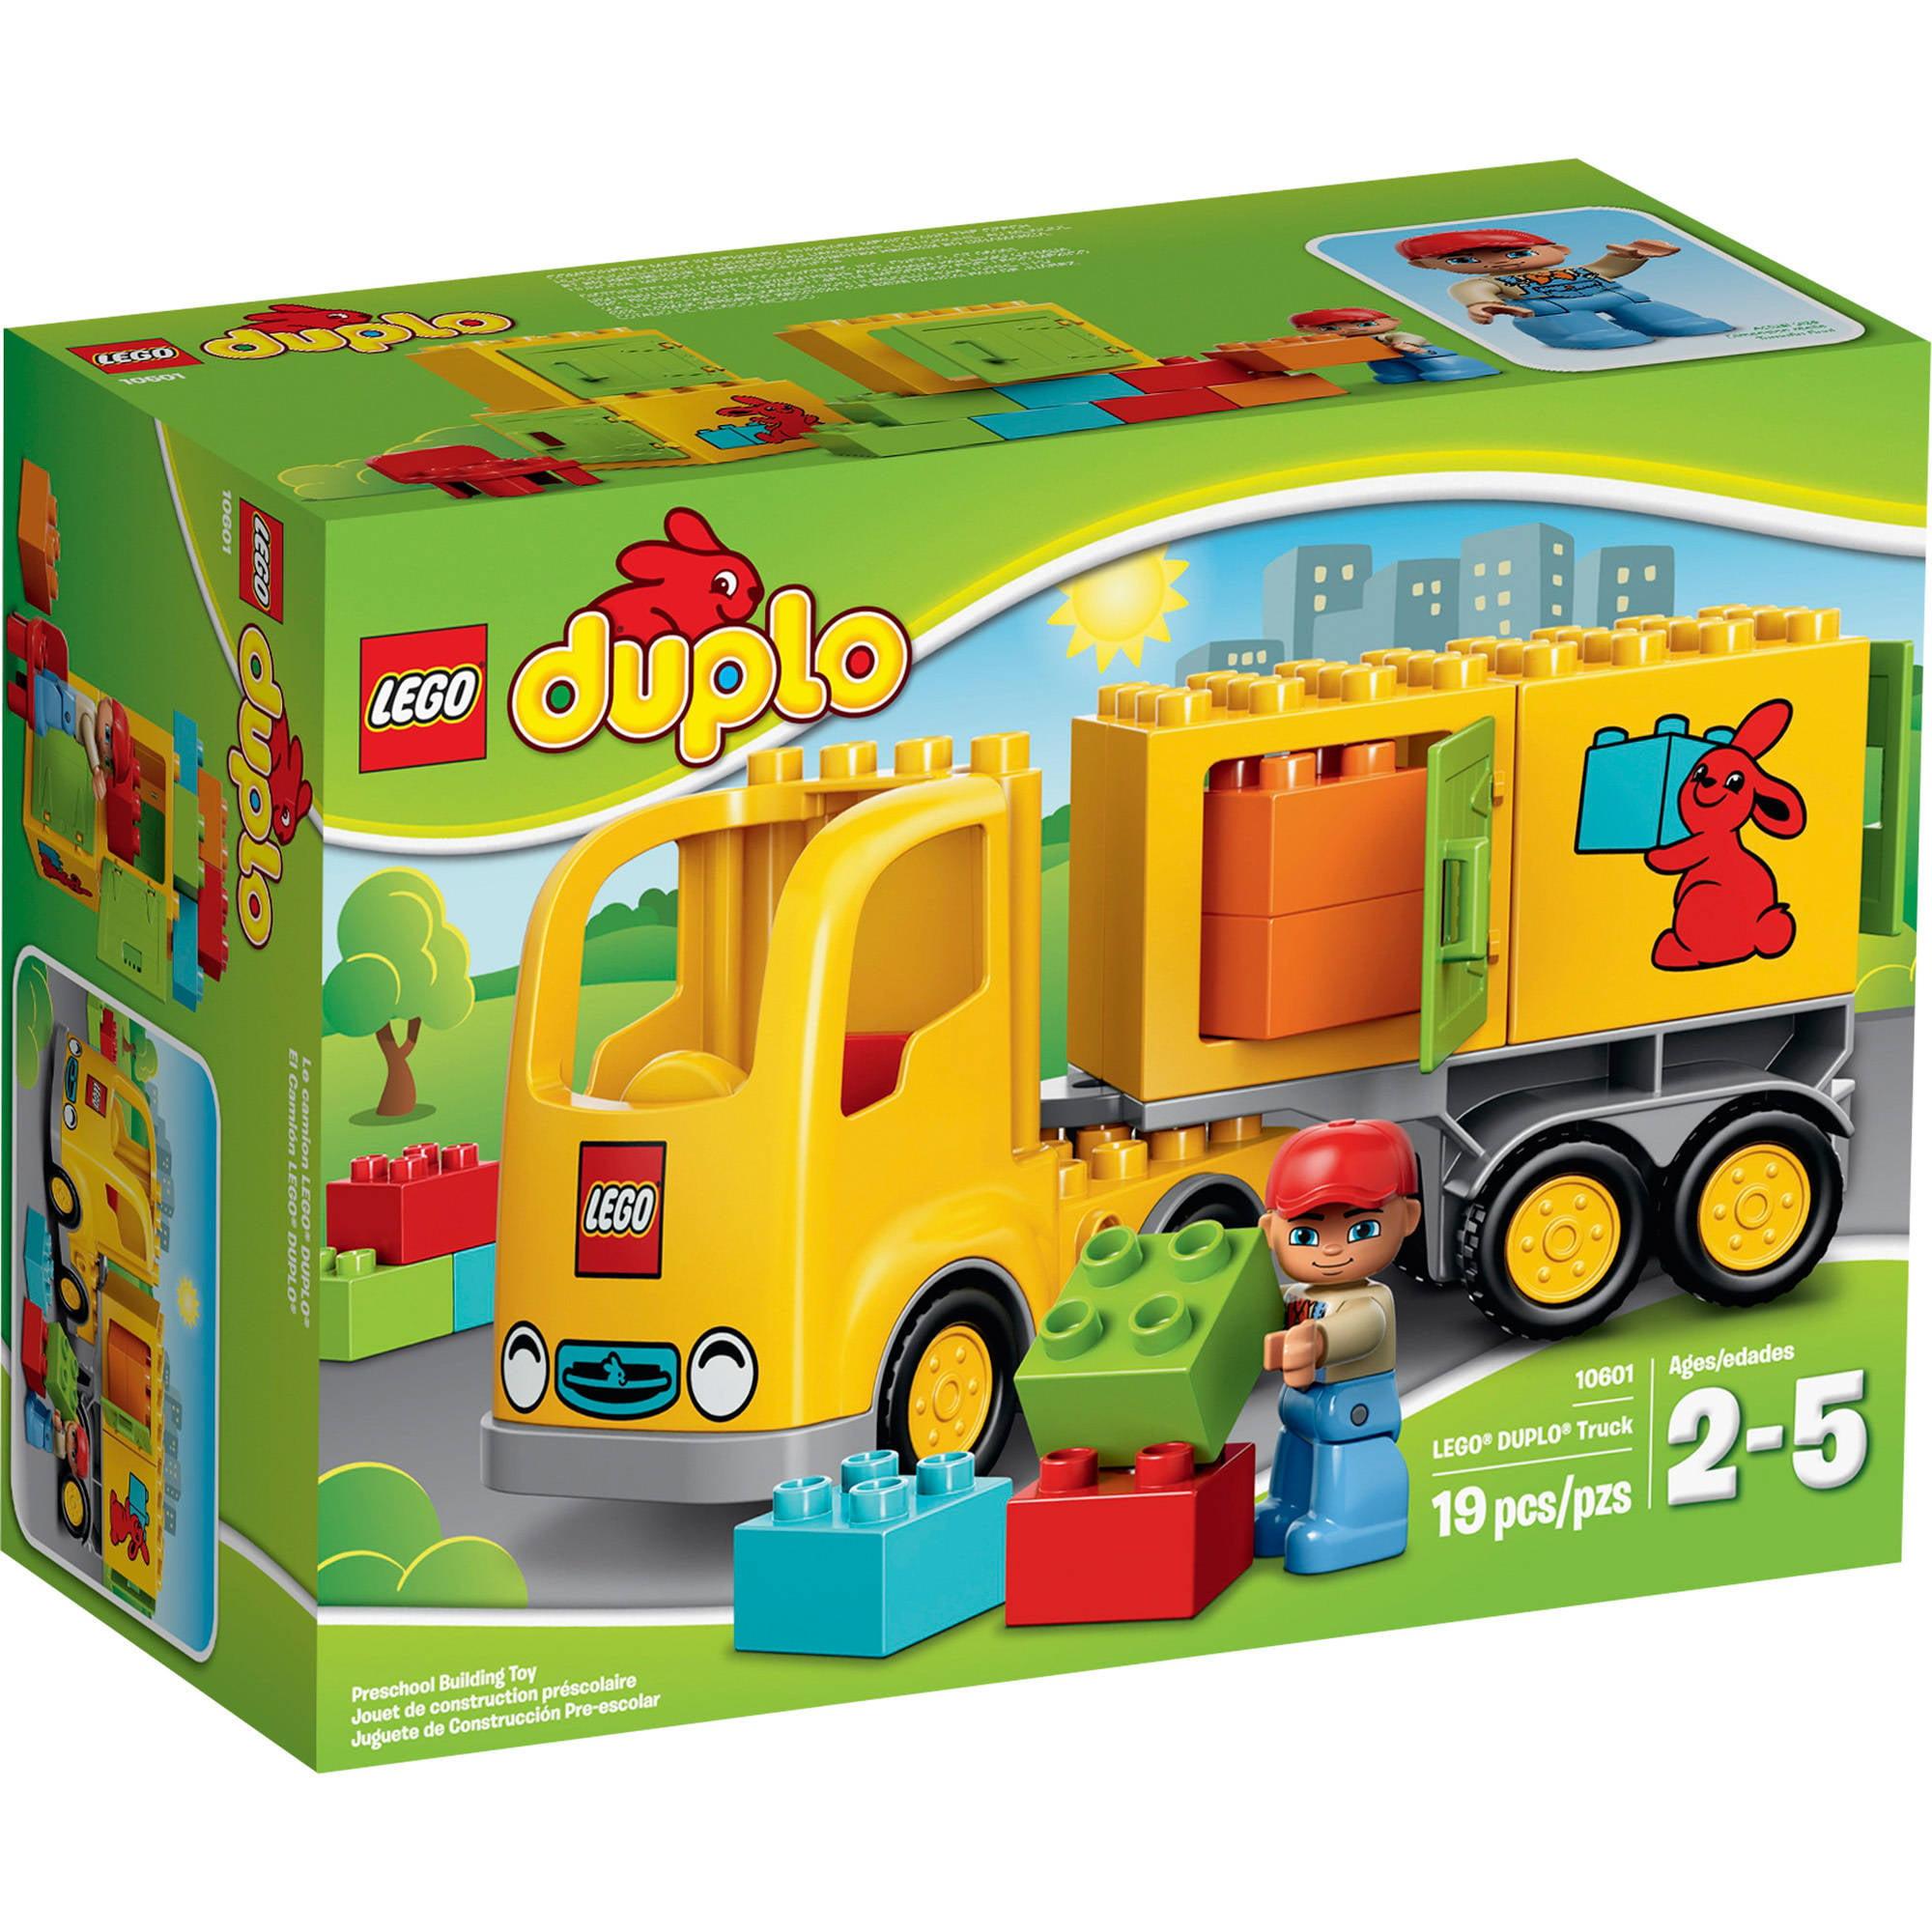 Lego Chima Spinlyns Cavern Building Set Walmart